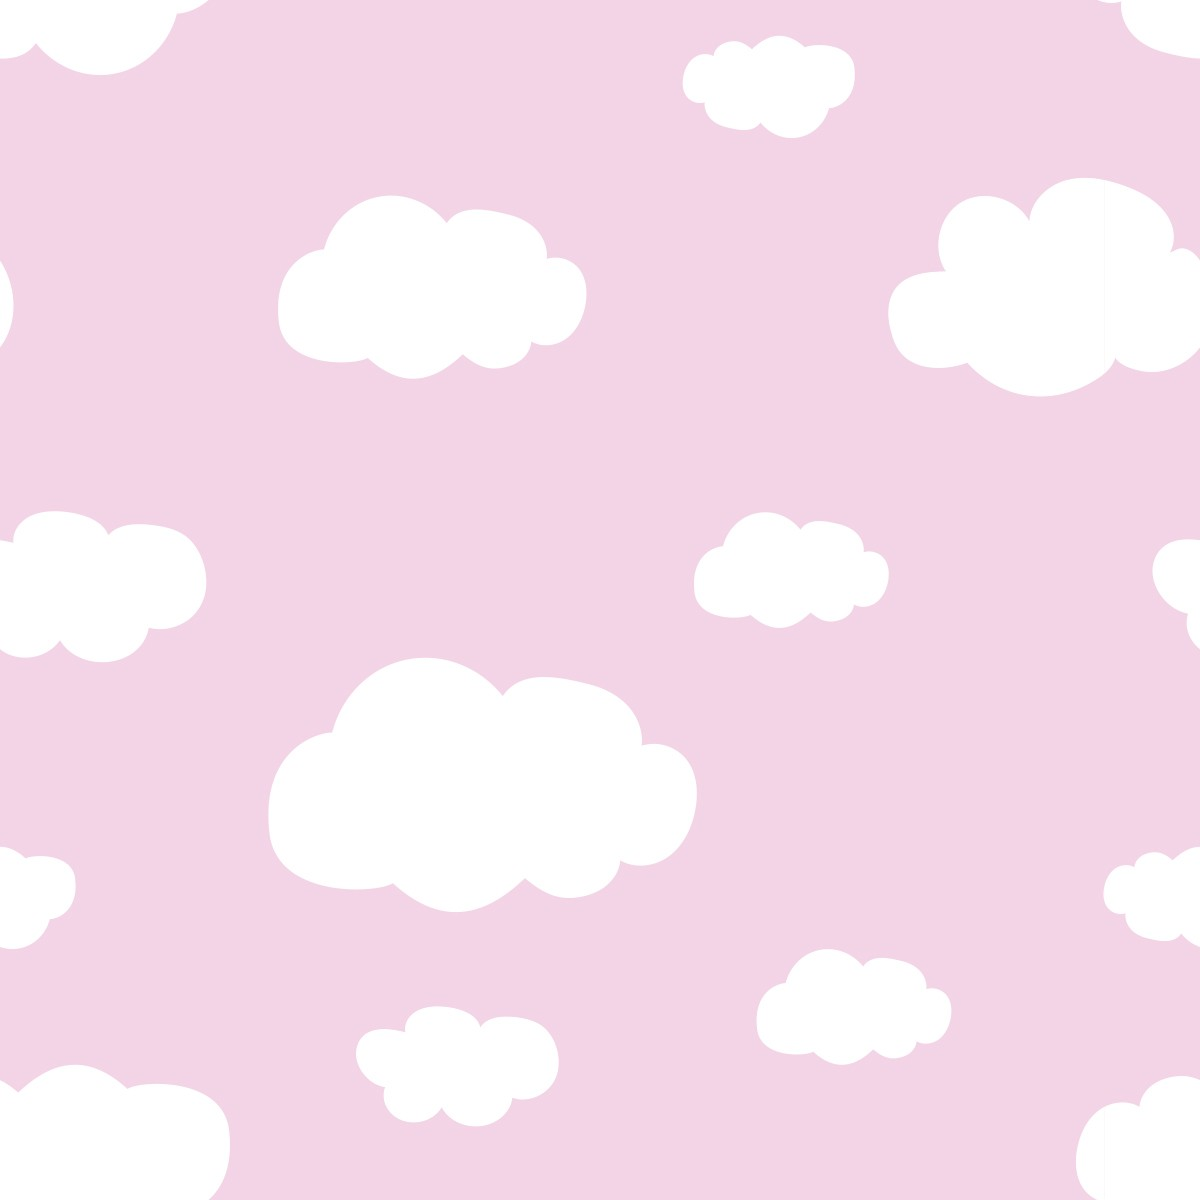 Papel de Parede Nuvens Cute Céu Bebê Adesivo